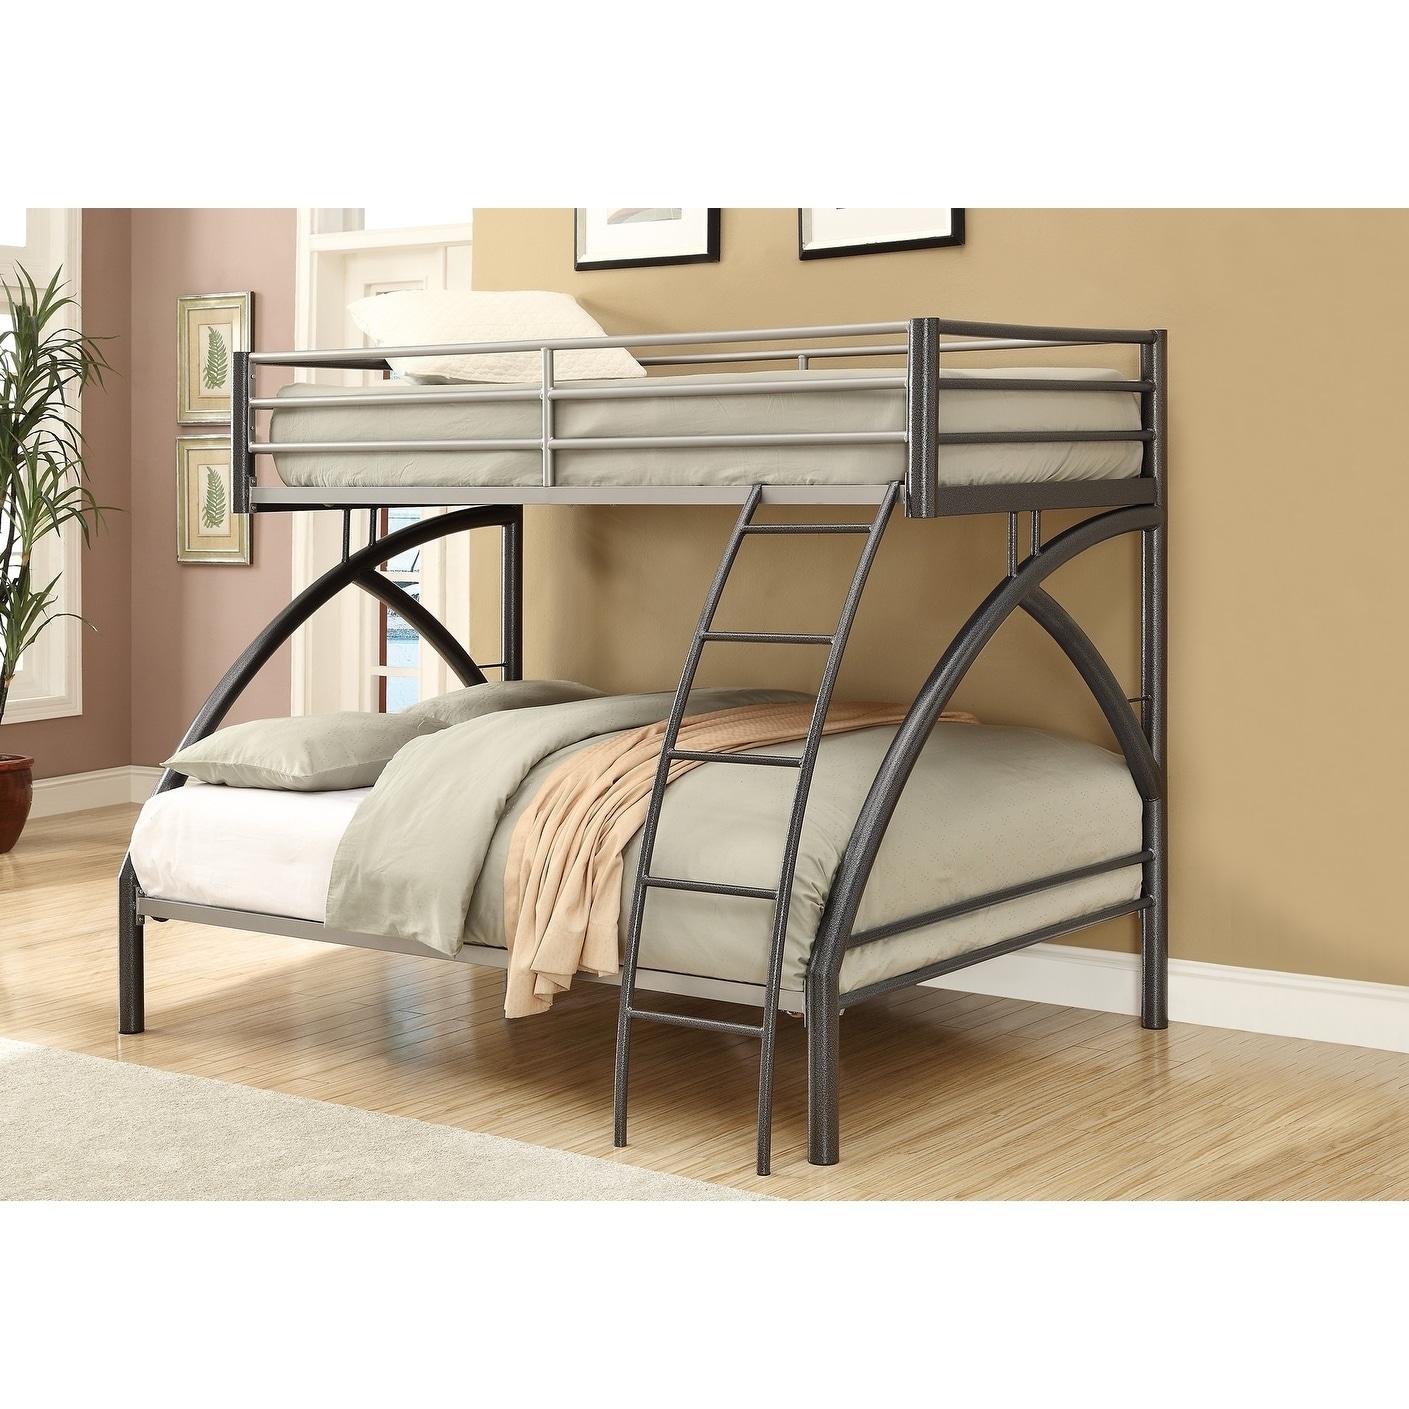 Image result for metal bunk beds